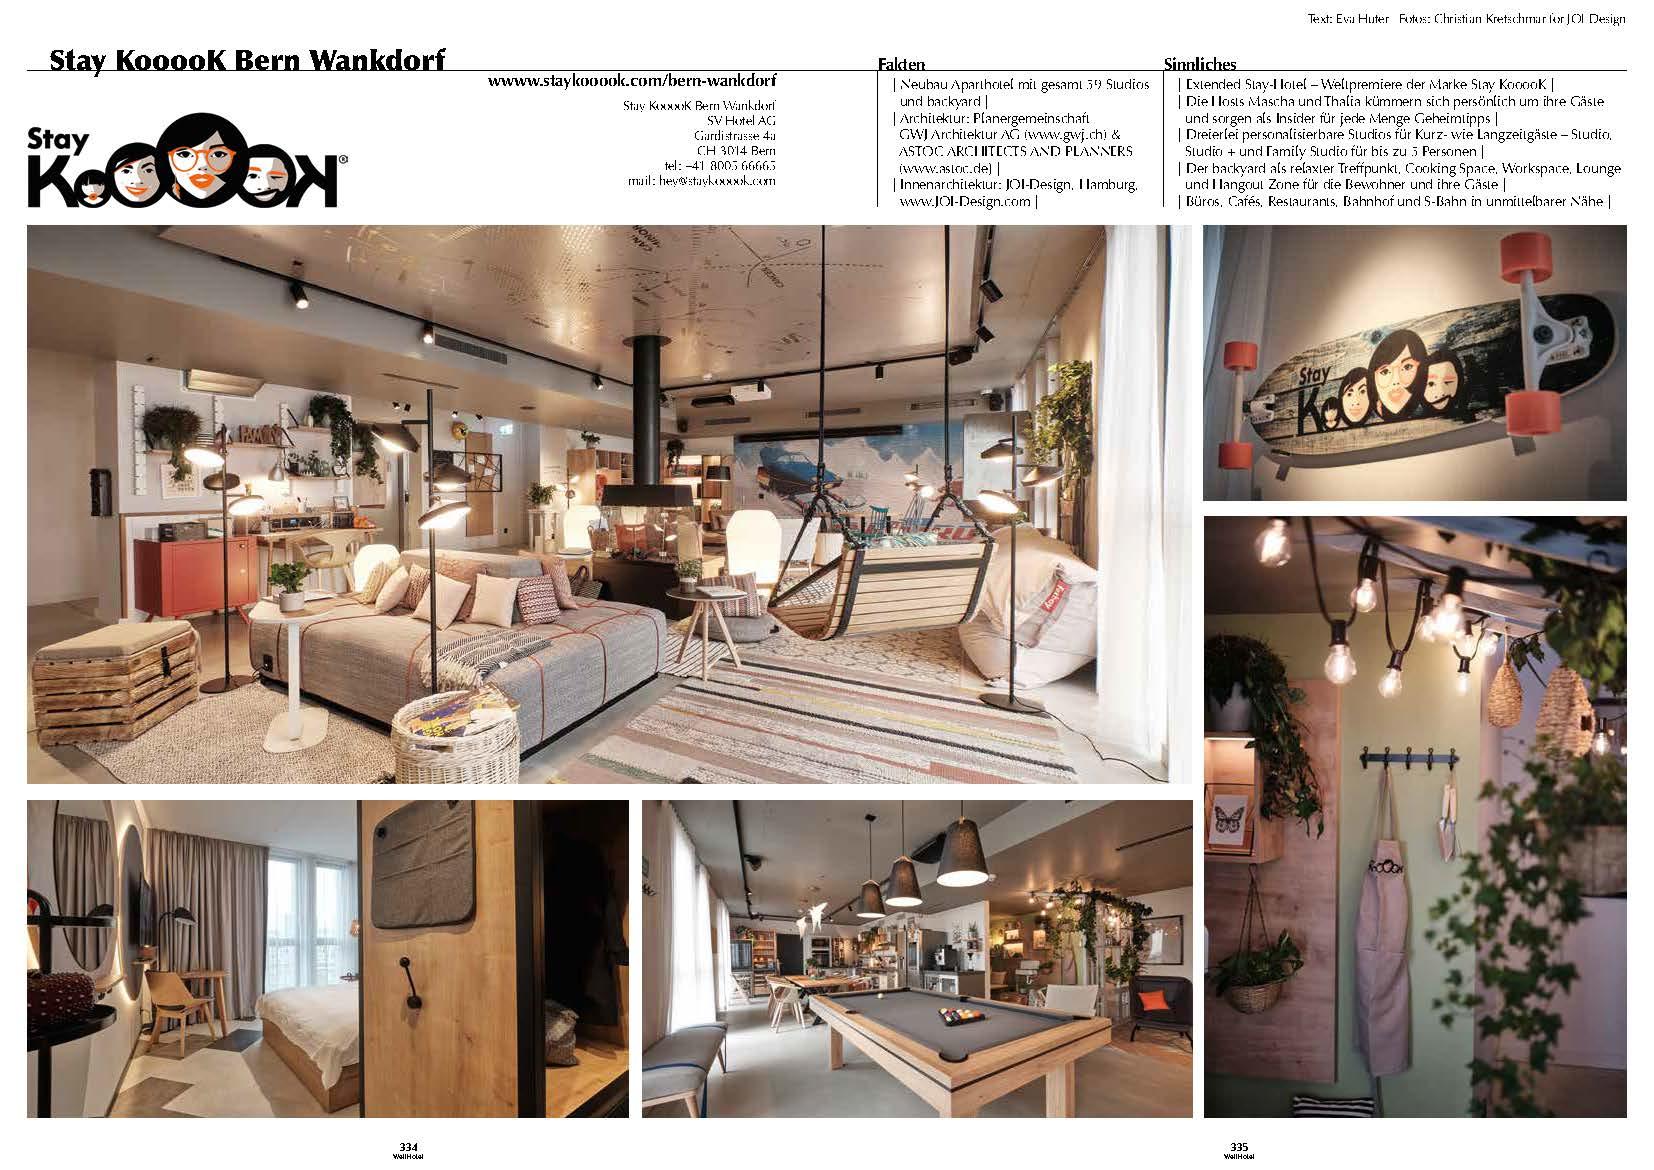 wellhotel   Stay KooooK Bern   JOI Design   Innenarchitektur ...